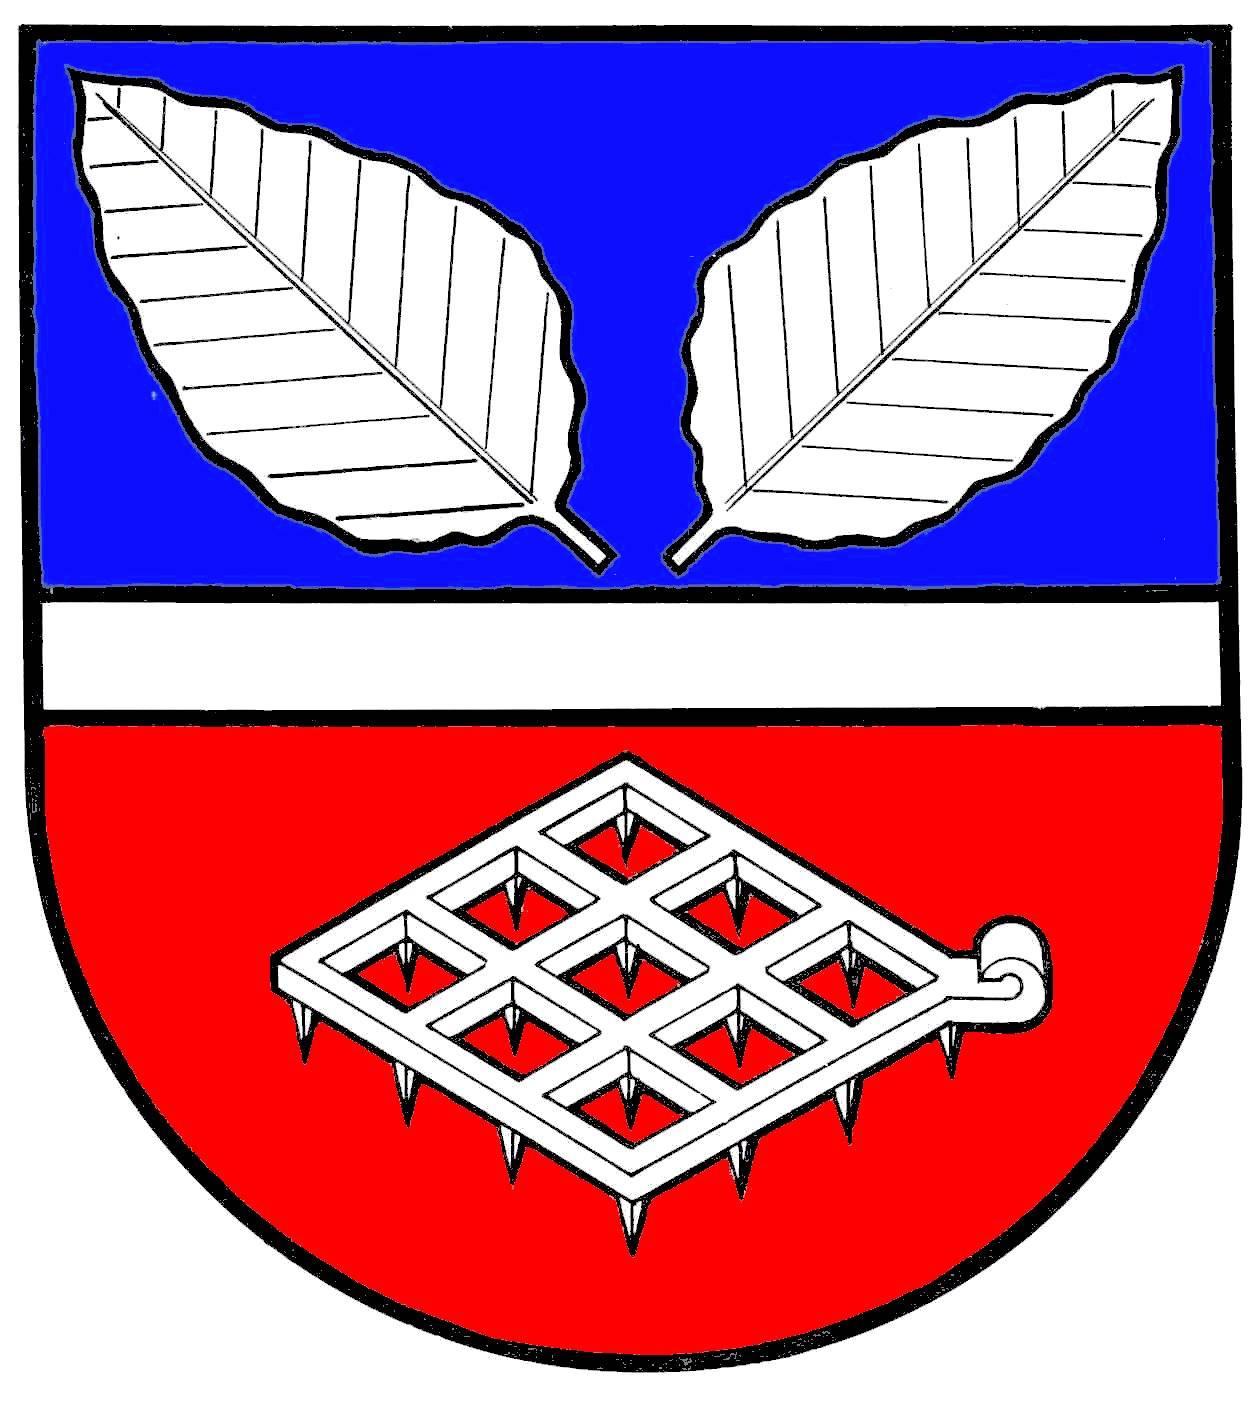 Wappen GemeindeBrodersdorf, Kreis Plön